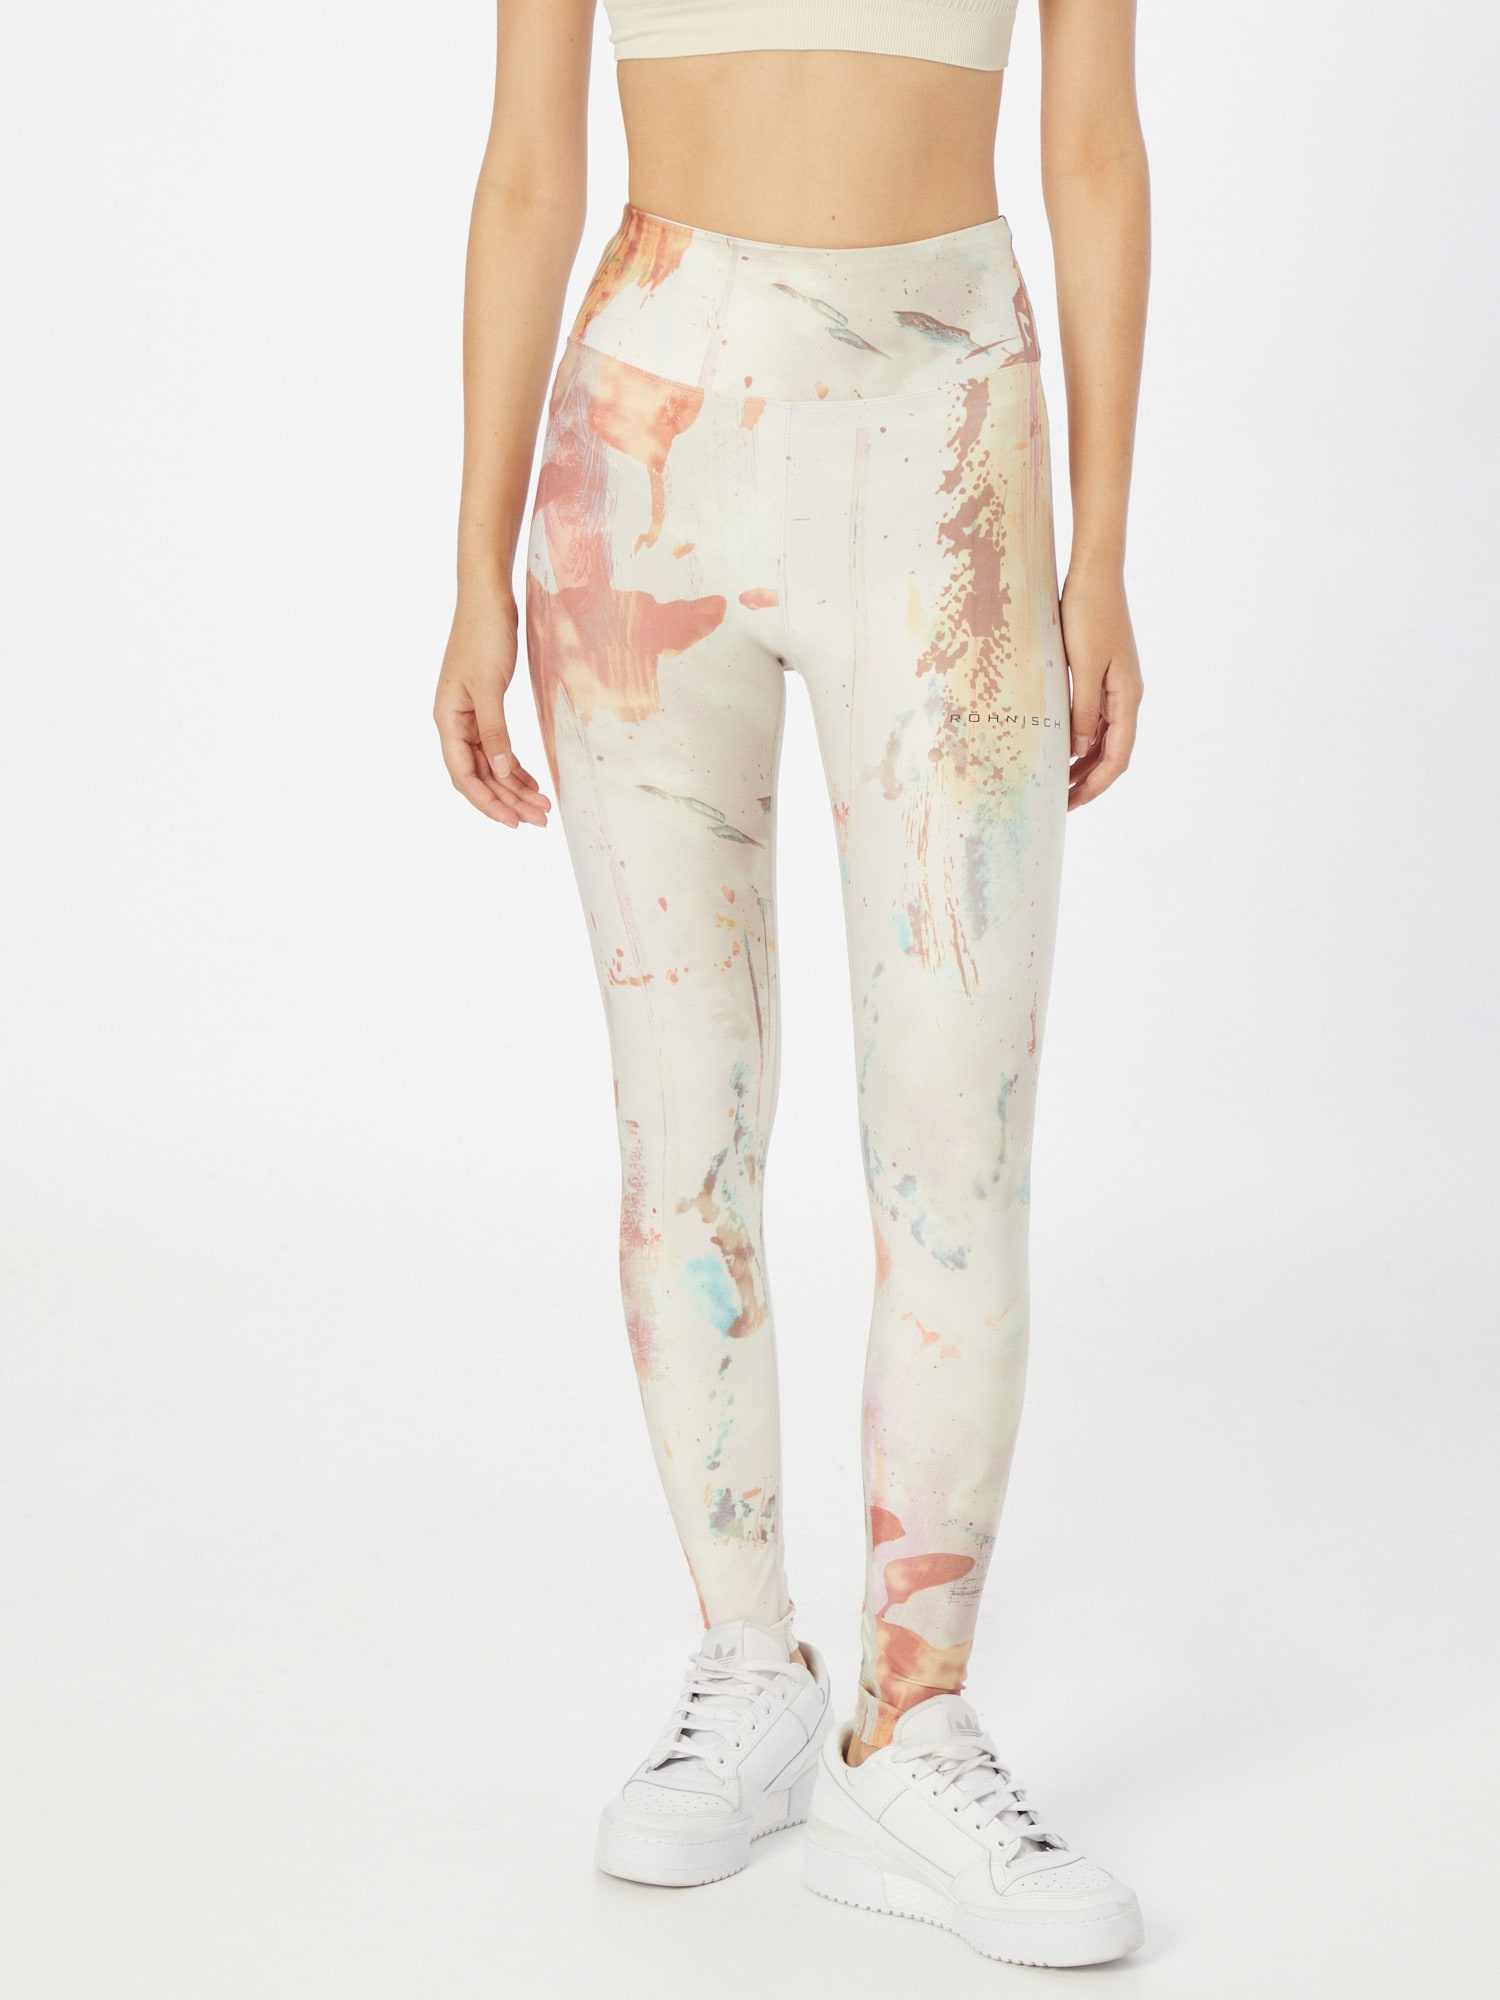 Röhnisch Športové nohavice KEIRA  biela / pastelovo červená / vodová / pastelovo ružová dámské S